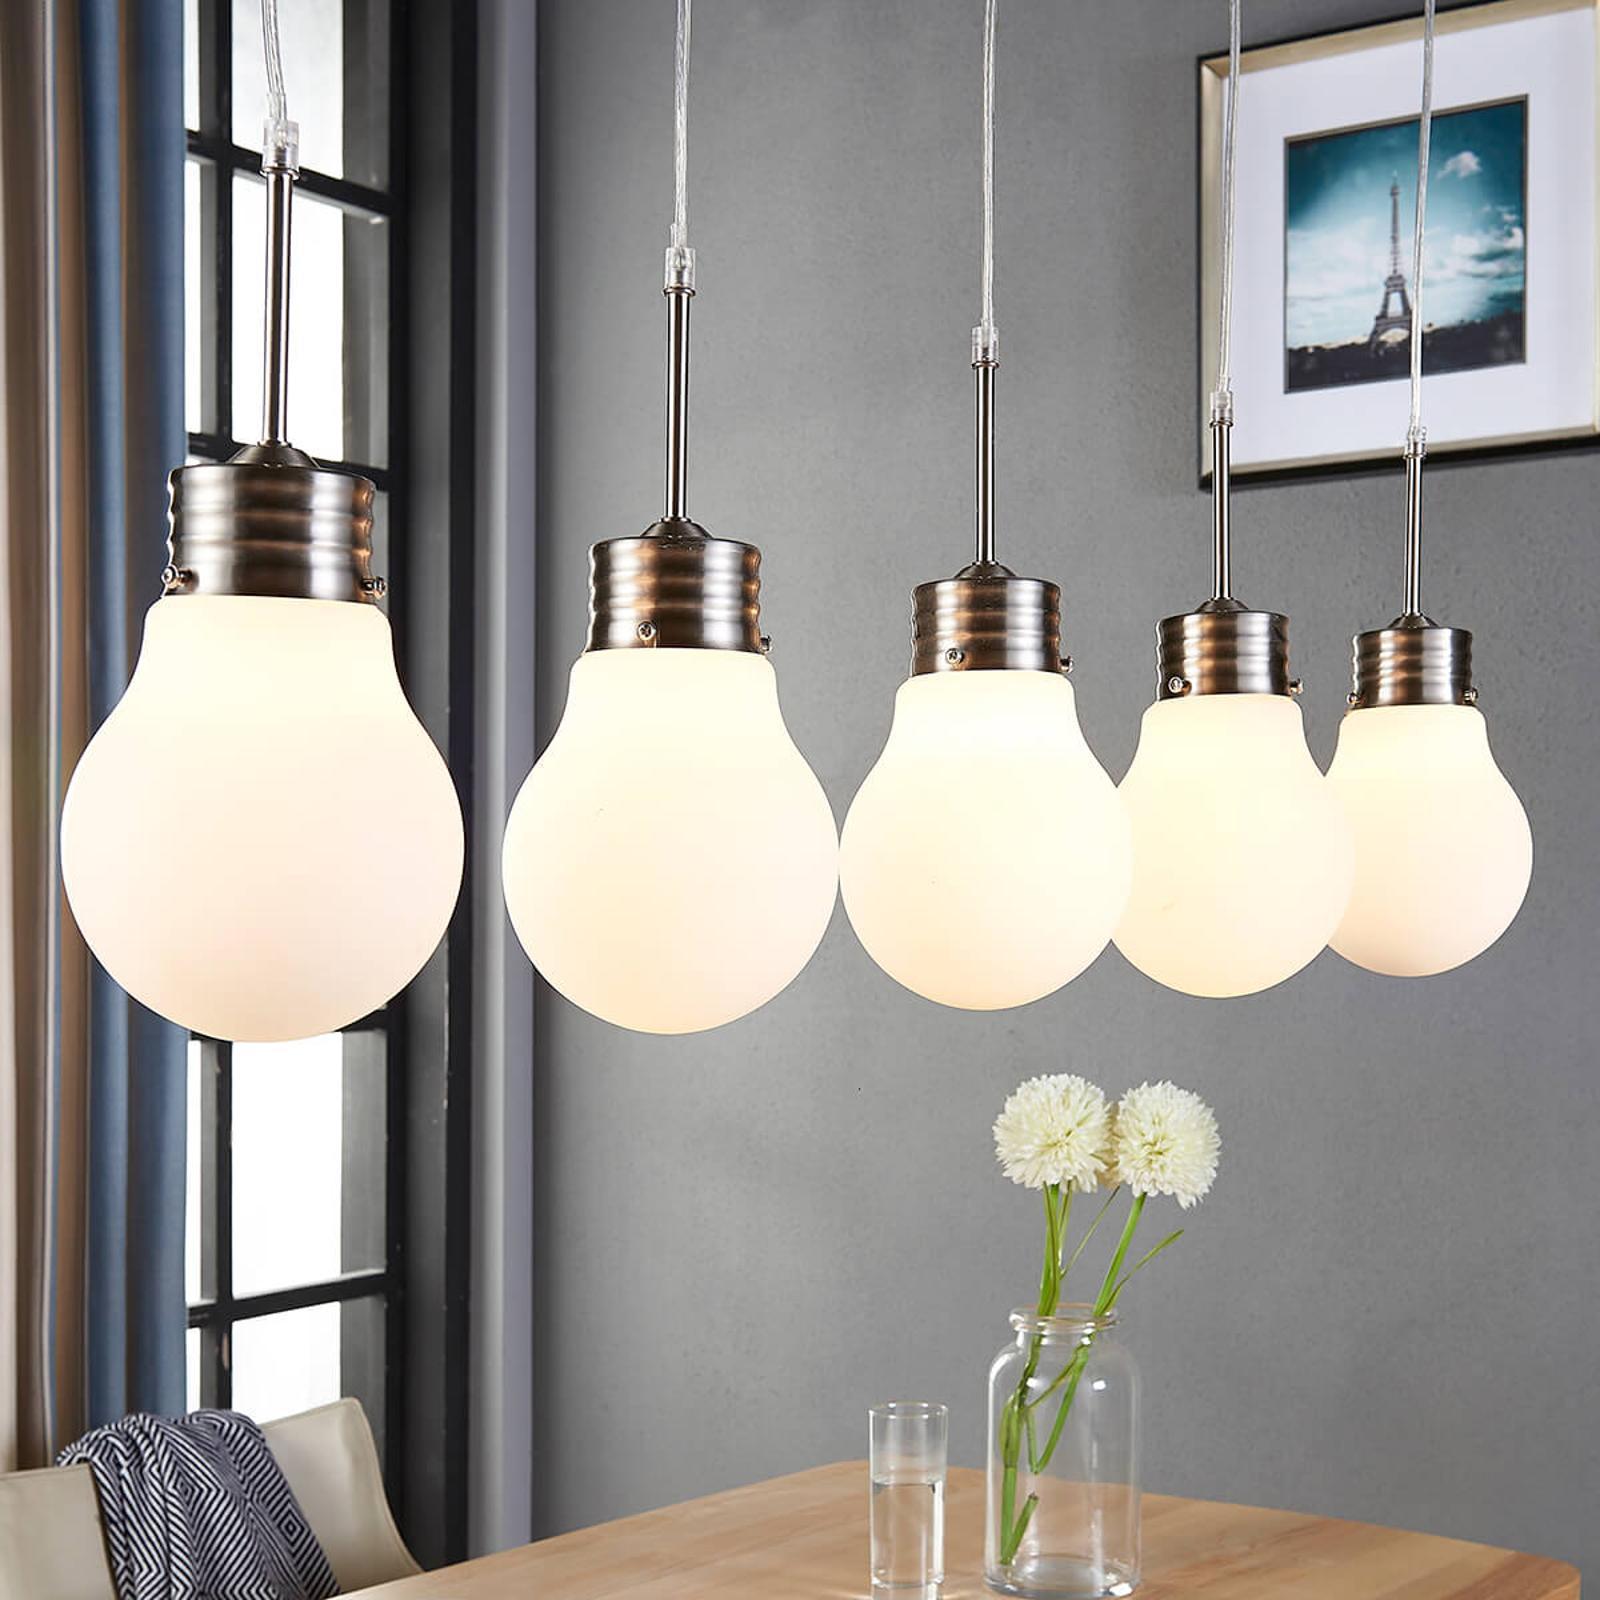 Lampada LED Bado dimmerabile, 5 punti luce